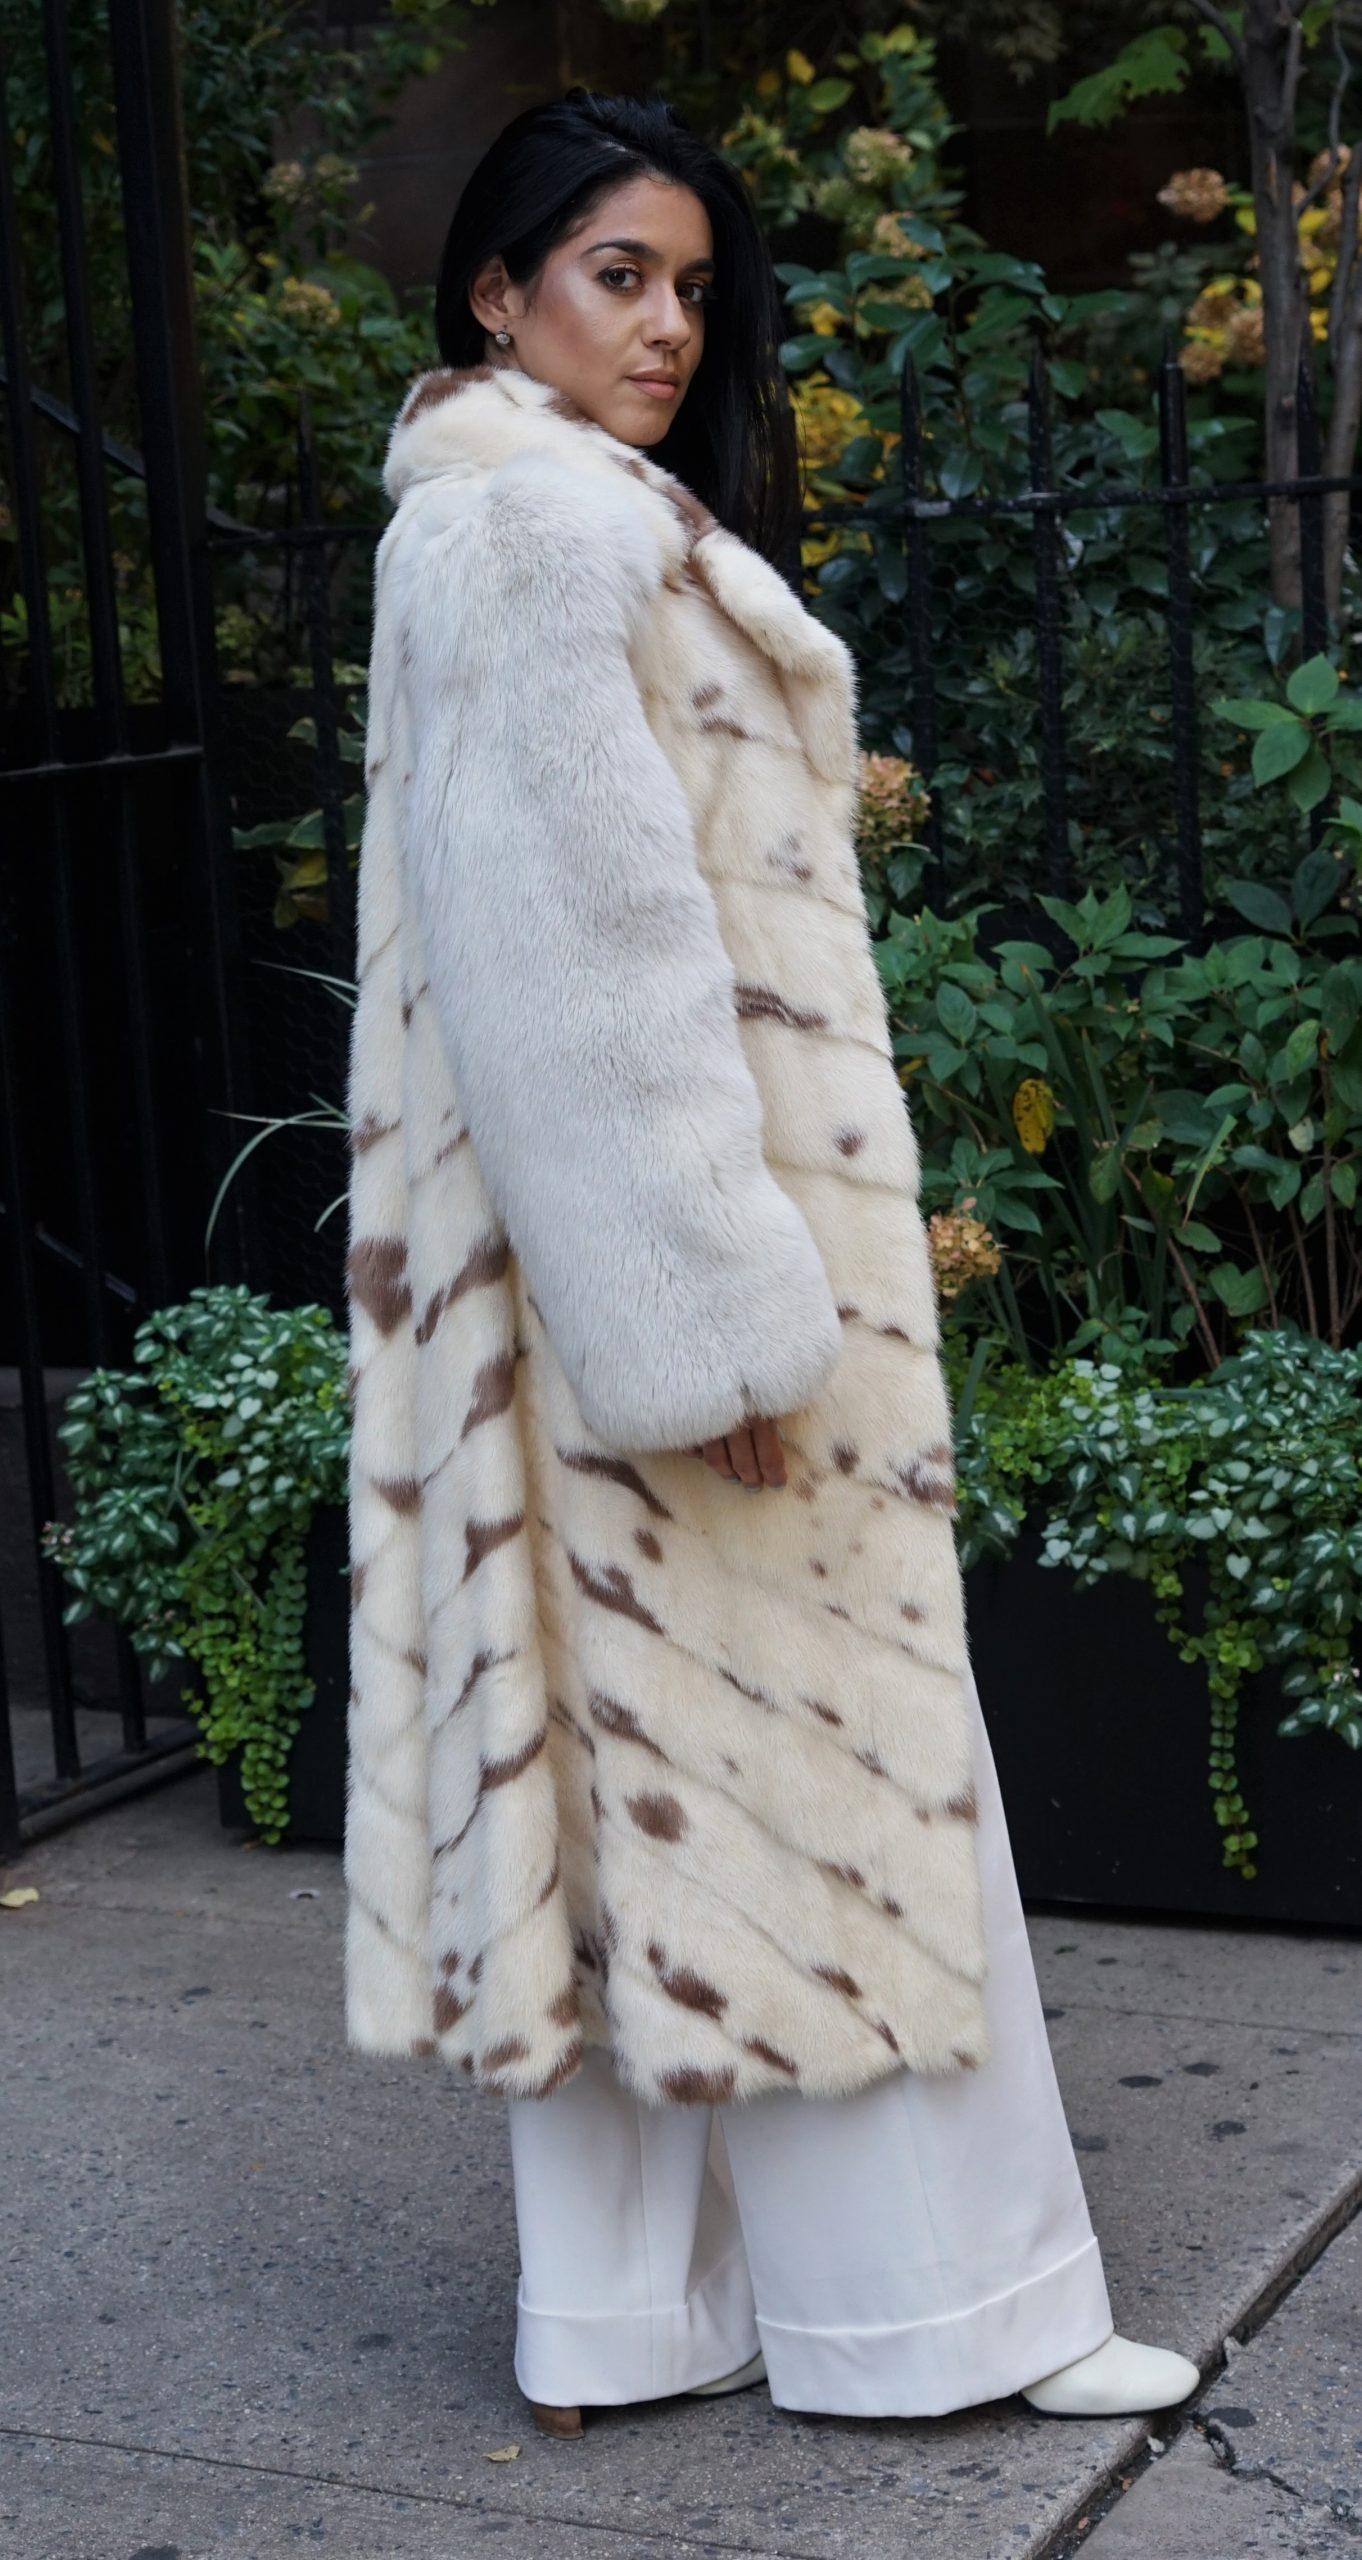 Brown furs